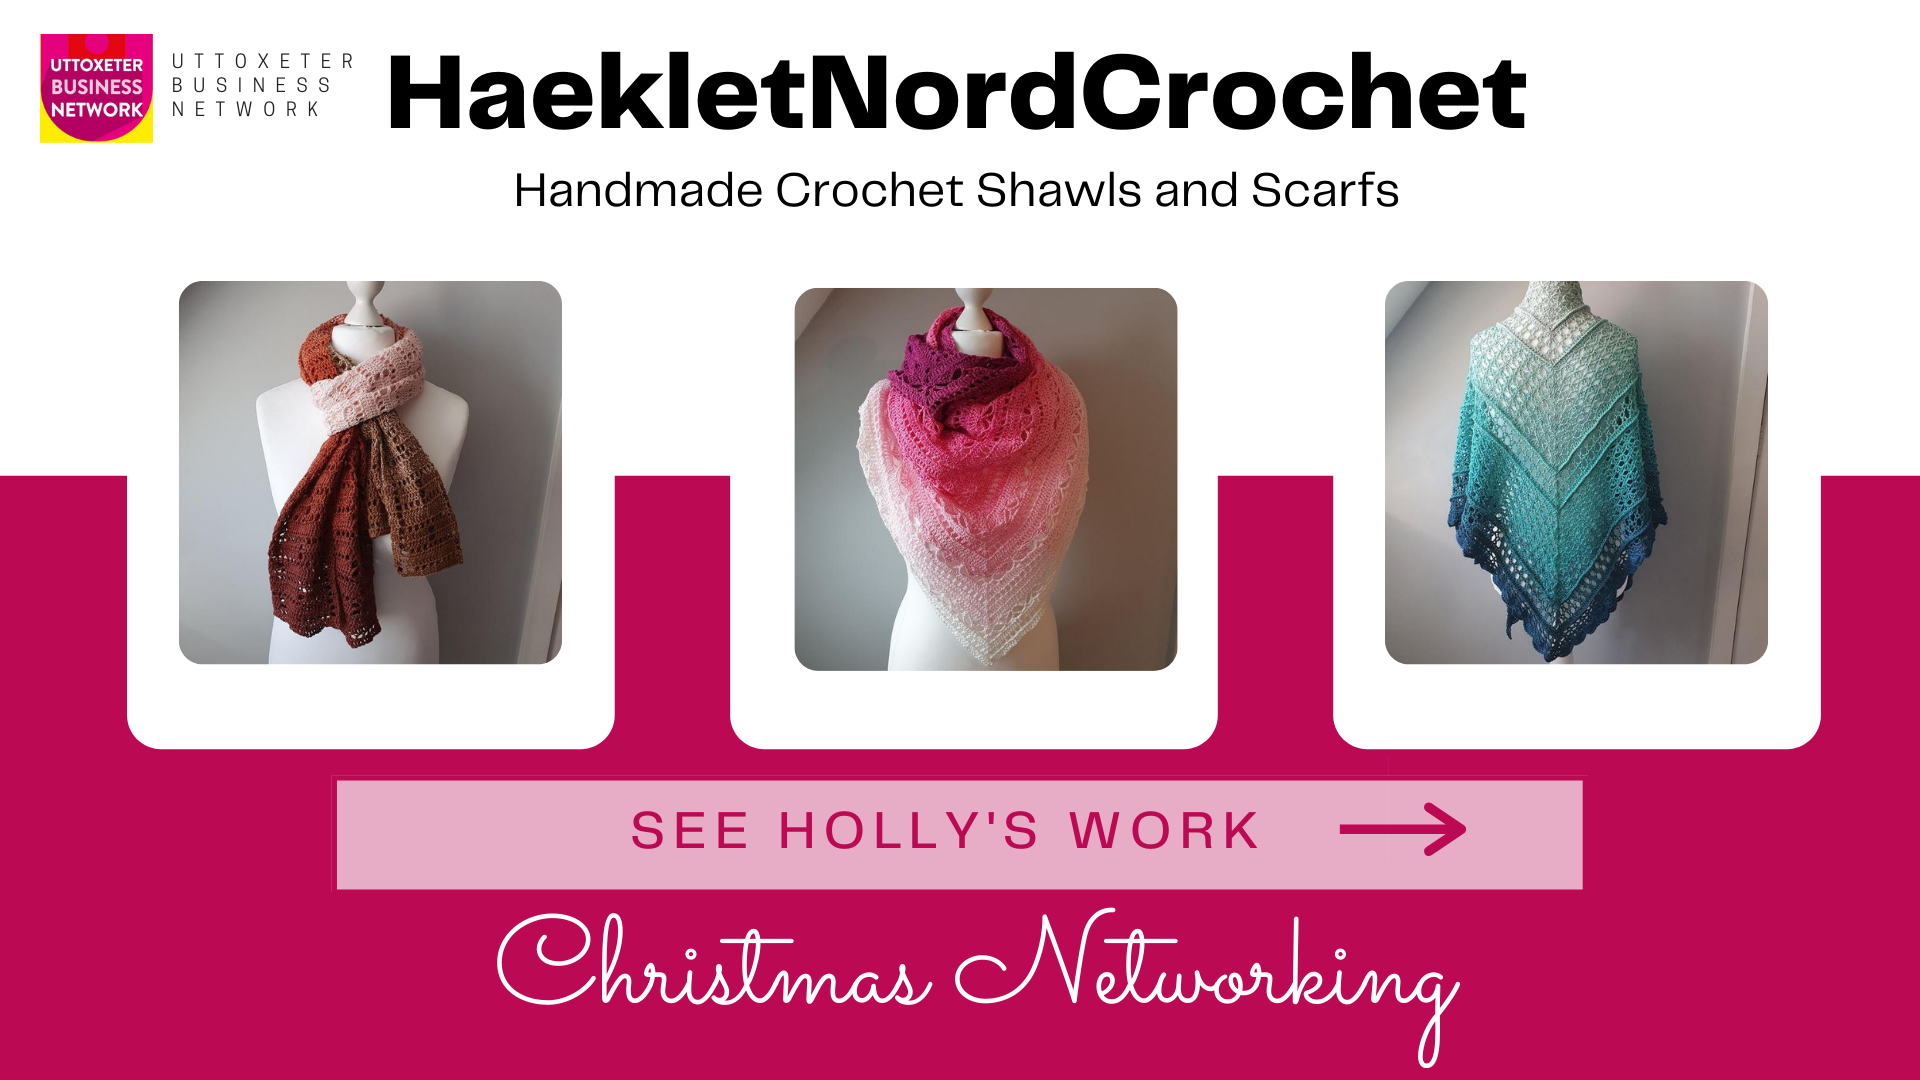 Holly - Christmas Netowrking